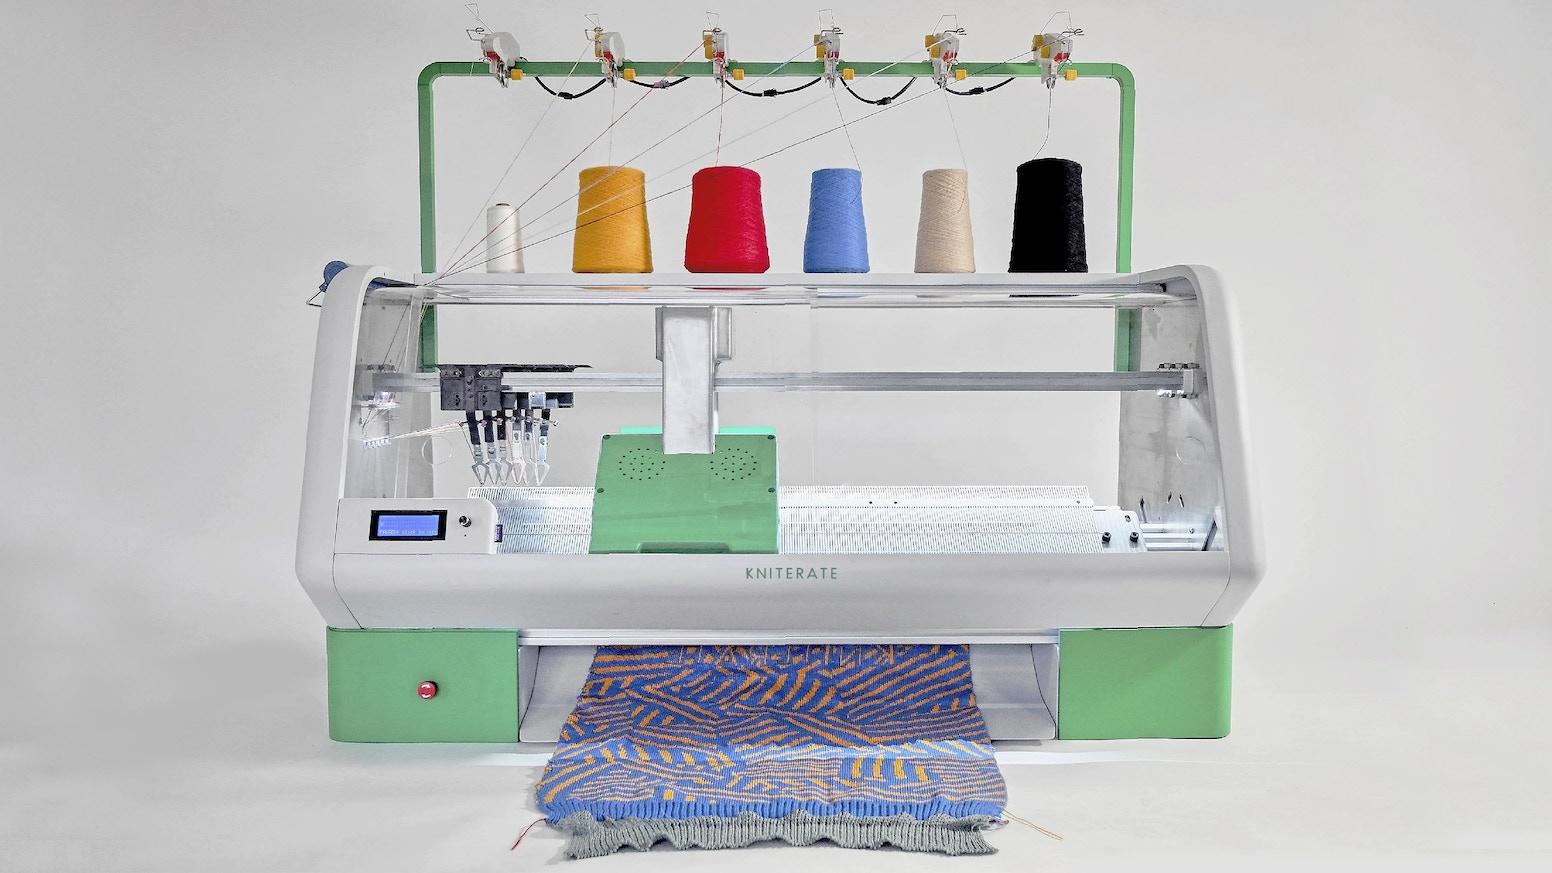 Kniterate the digital knitting machine by kniterate kickstarter a compact digital knitting machine to bring fashion fabrication colourmoves